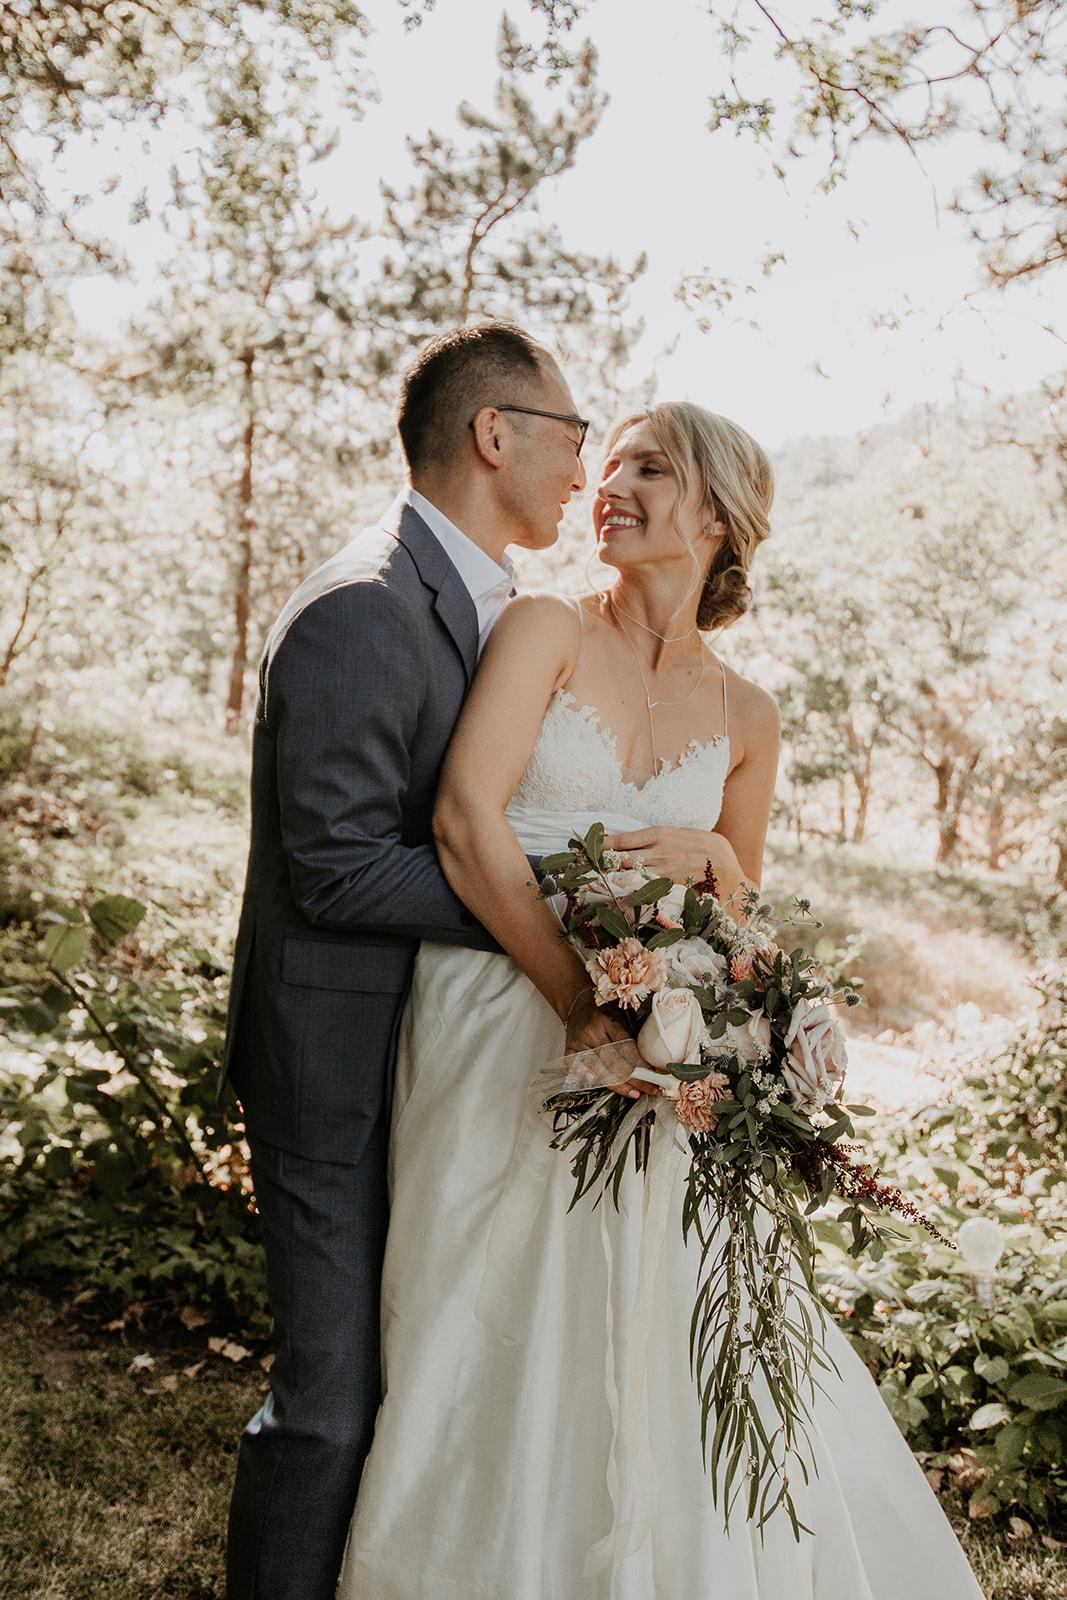 With Flourish Wedding Flowers - Rustic Blush Wedding